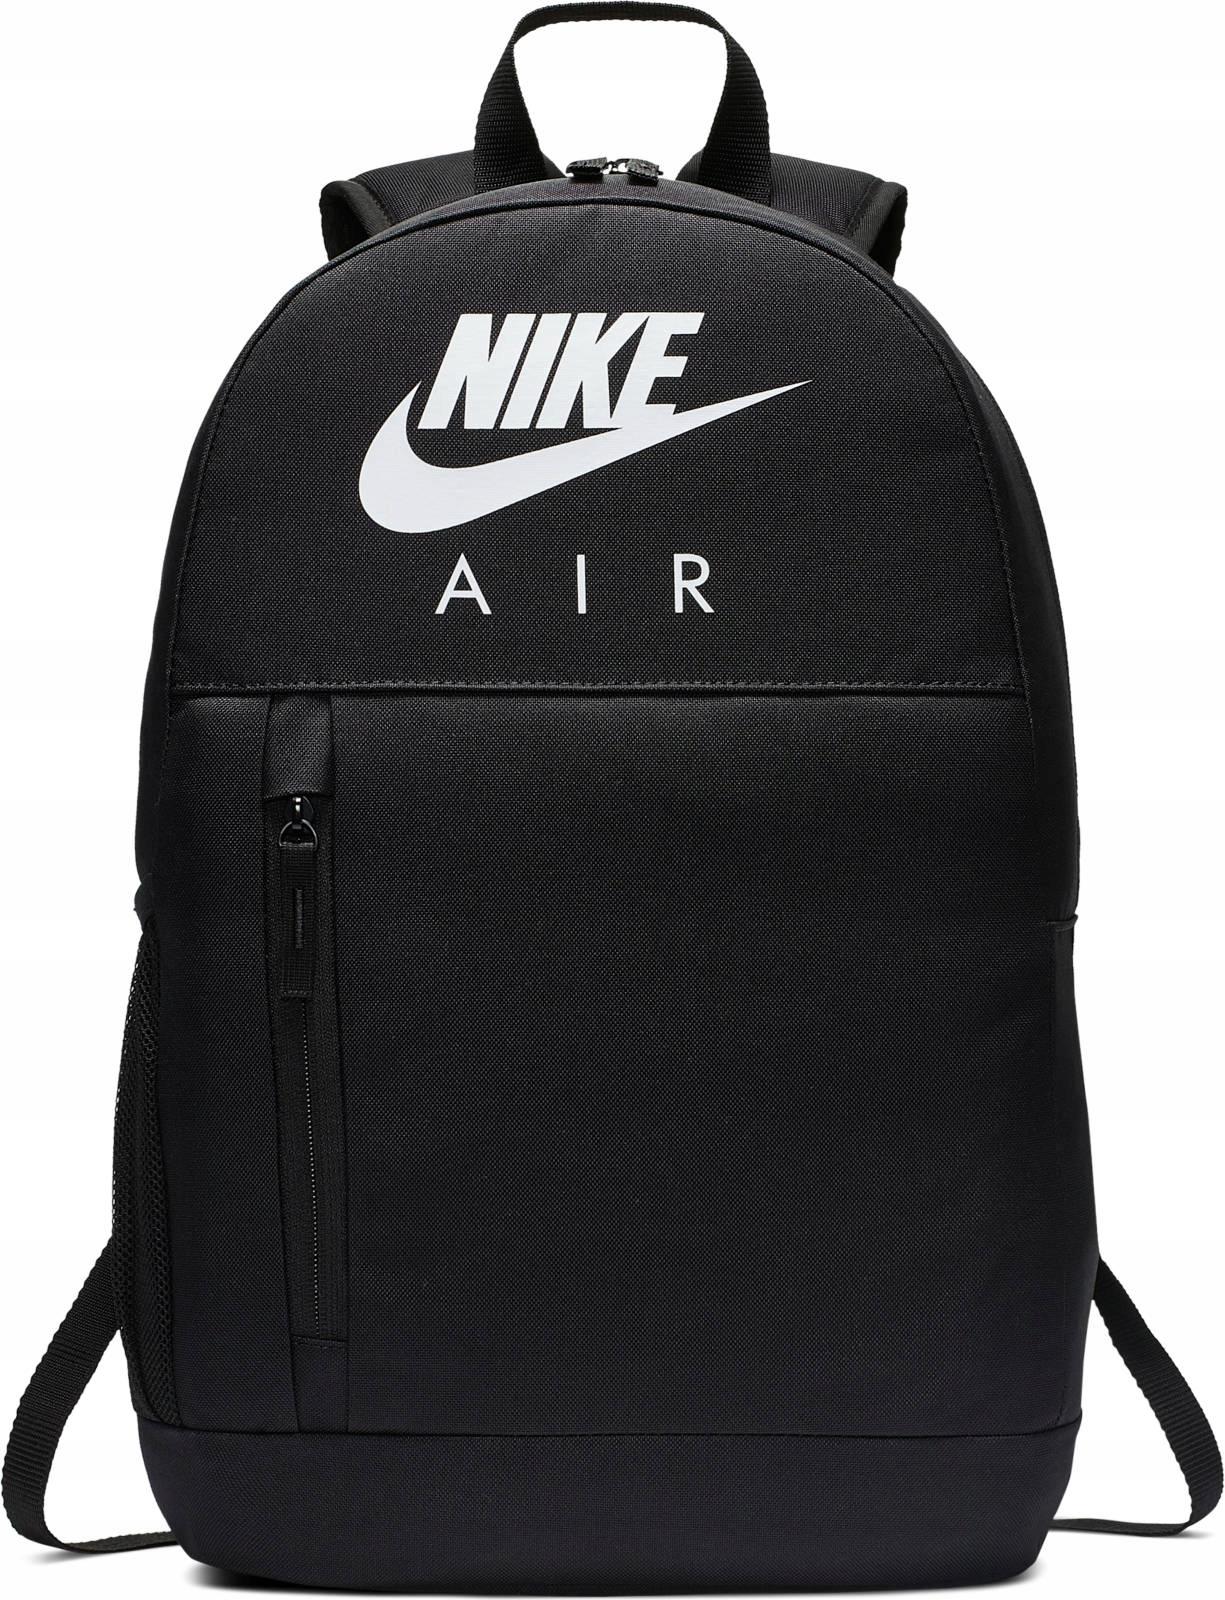 NIKE Спортивный рюкзак SCHOOL AIR + пенал BLACK